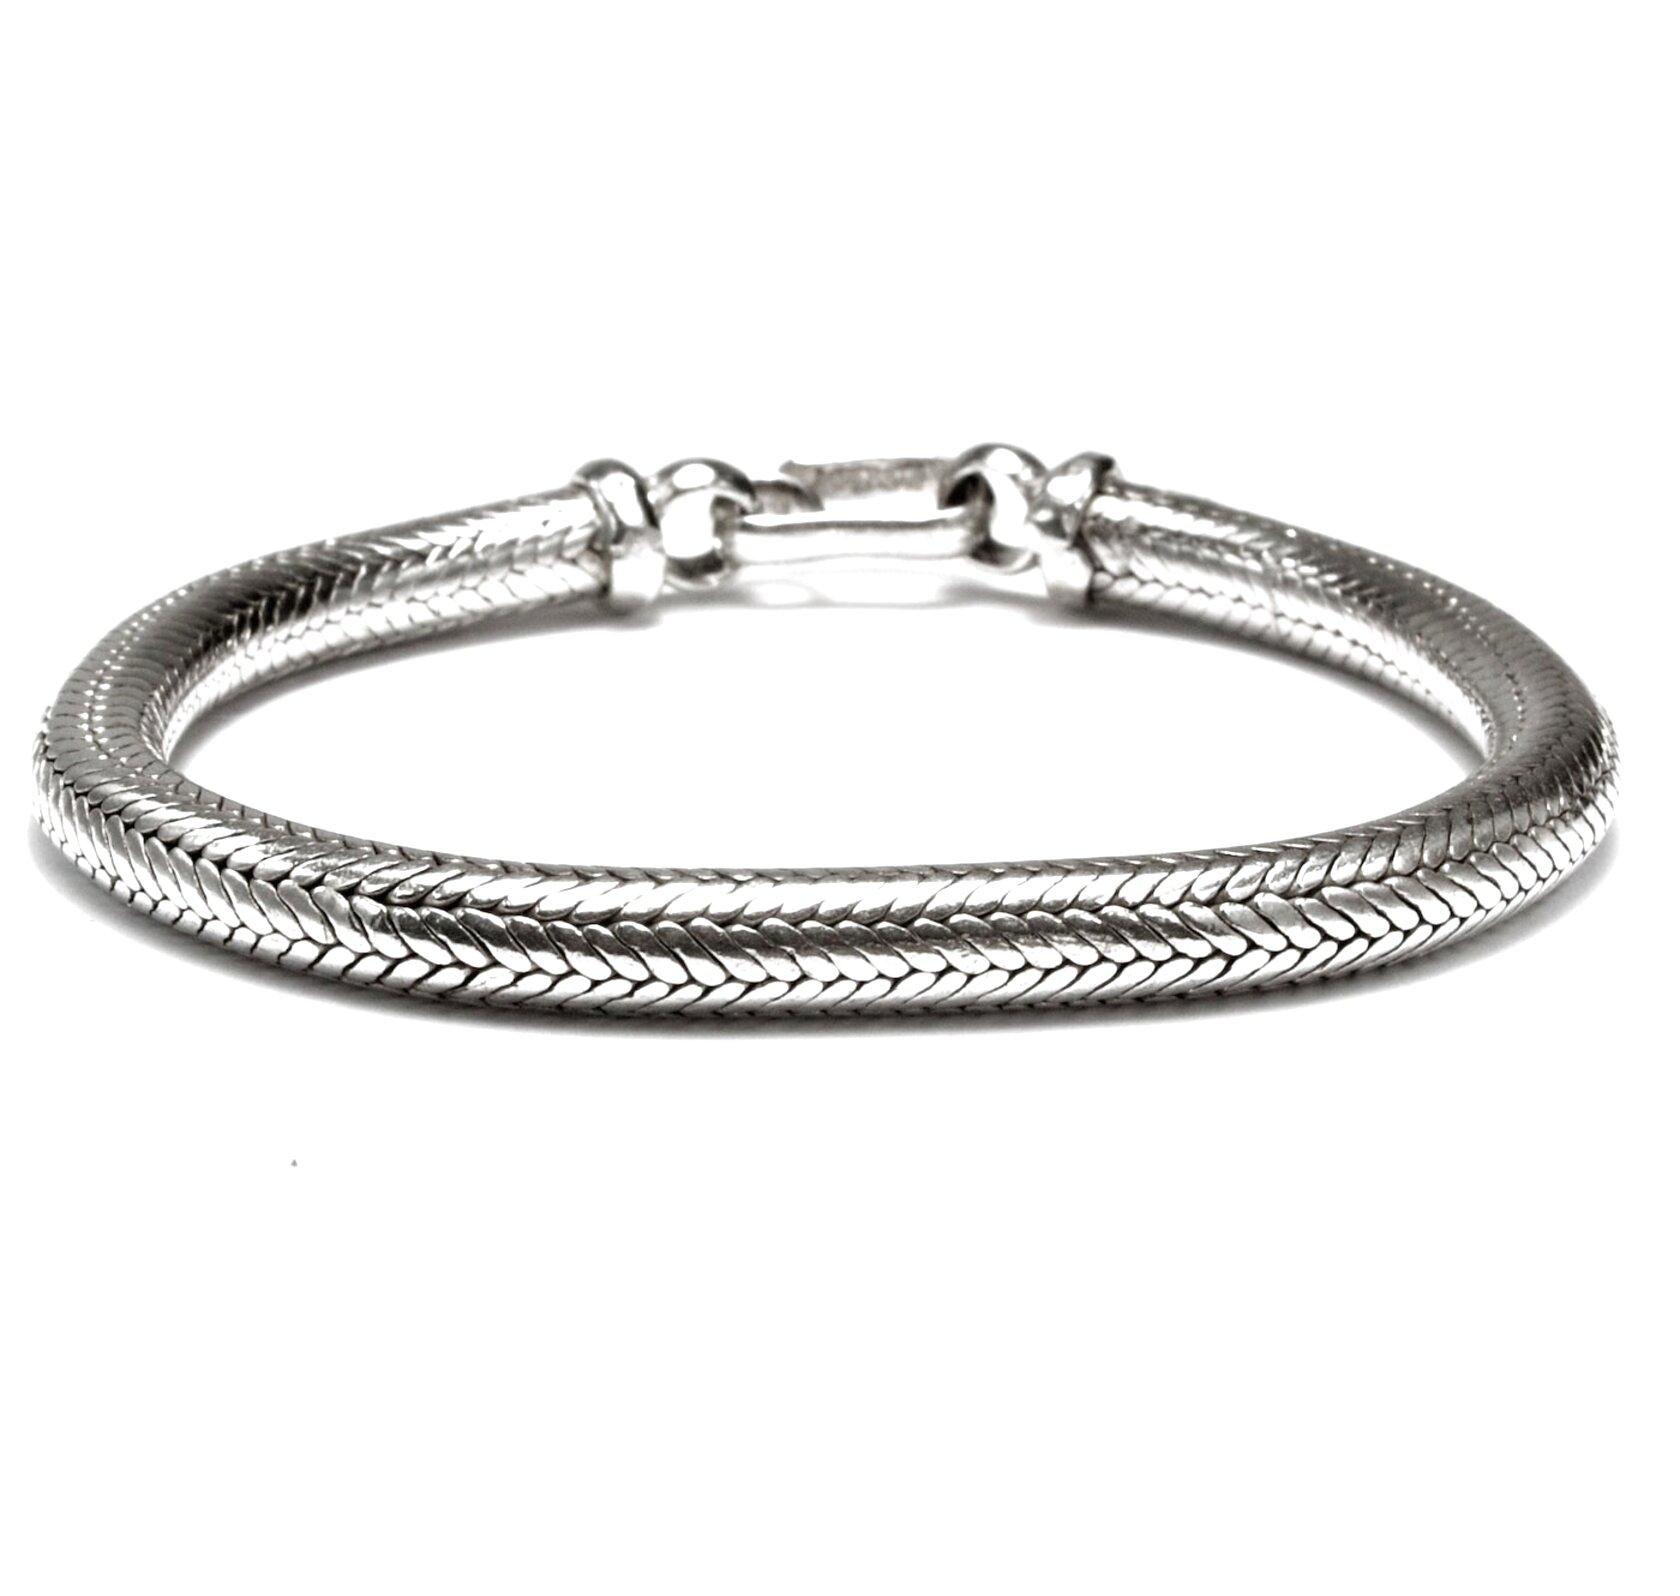 bagno argento indiano bracciale 100 gr snake  bracelet d 1x 24 CM  indian silver